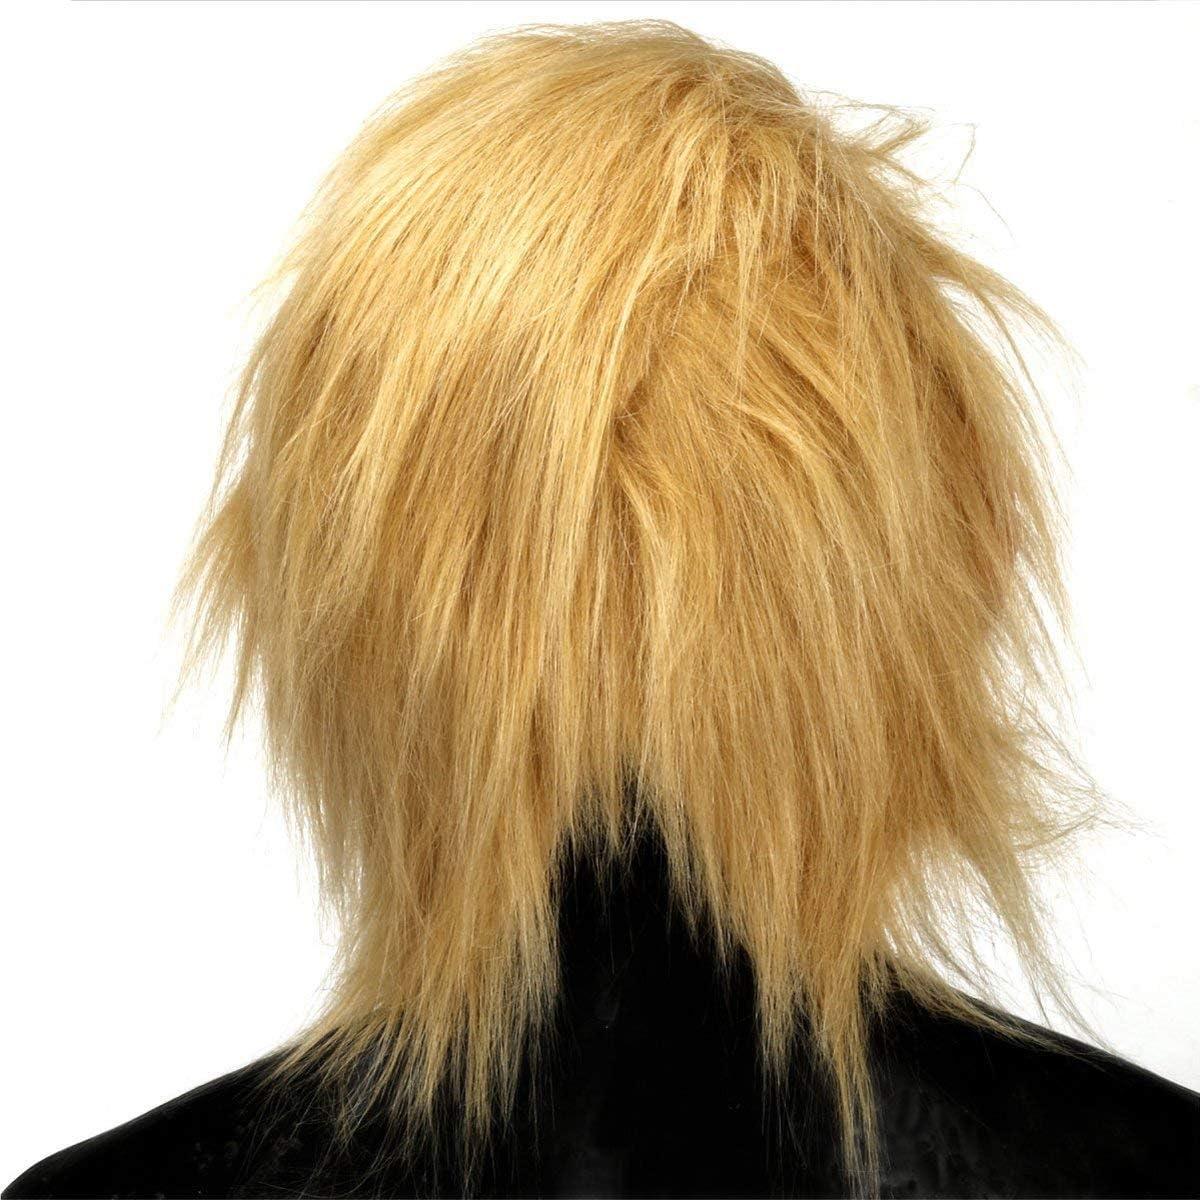 Fasching Karneval Maske Poltiker TK Gruppe Timo Klingler Donald Trump Maske Latex 1x Per/ücke aus Latex f/ür Herren und Damen Kost/üm